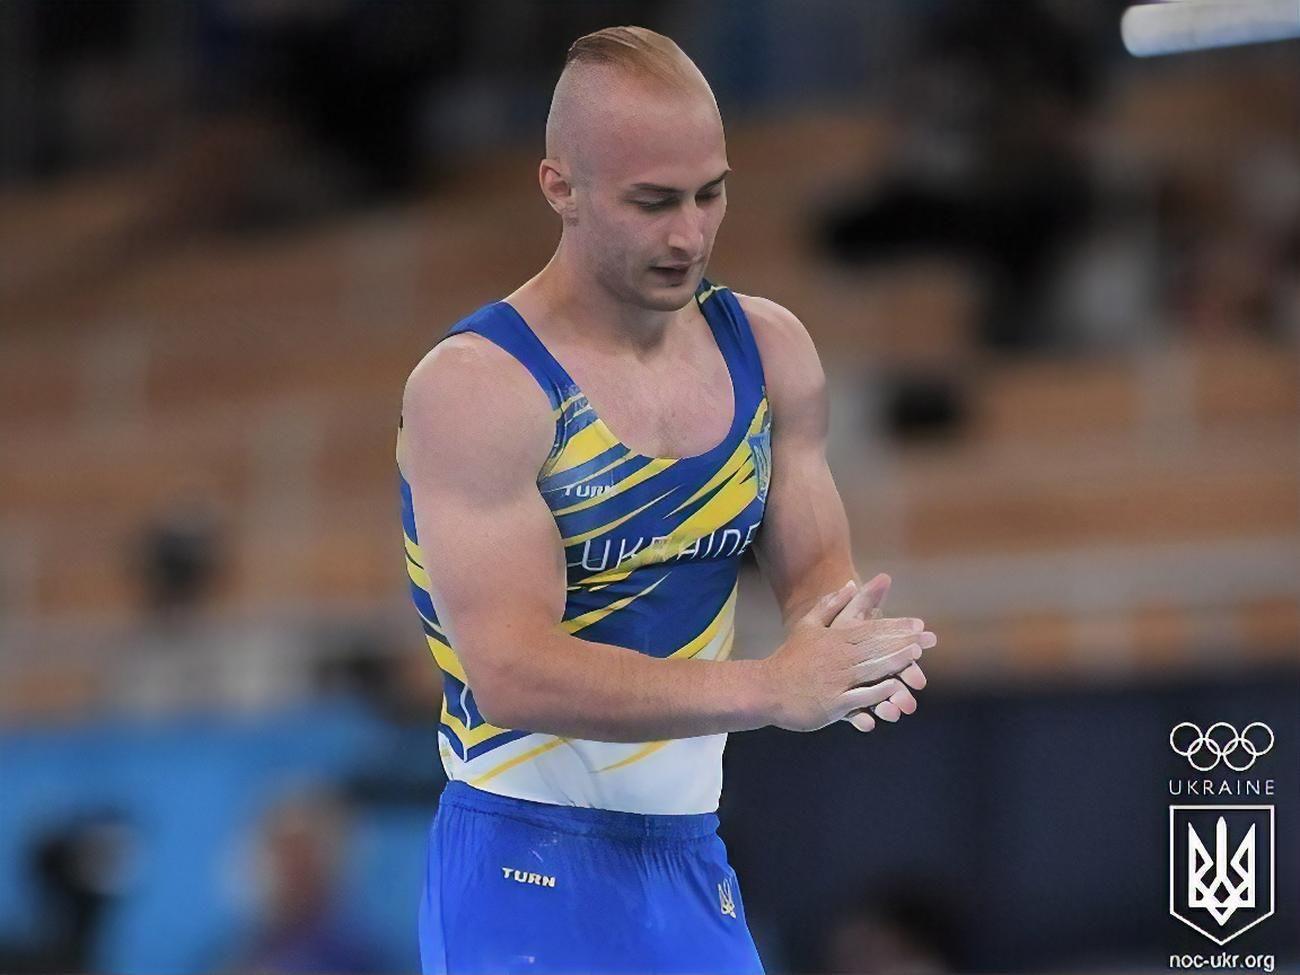 Украина установила антирекорд Олимпиад: наши гимнасты остались без наград на ОИ-2020 в Токио